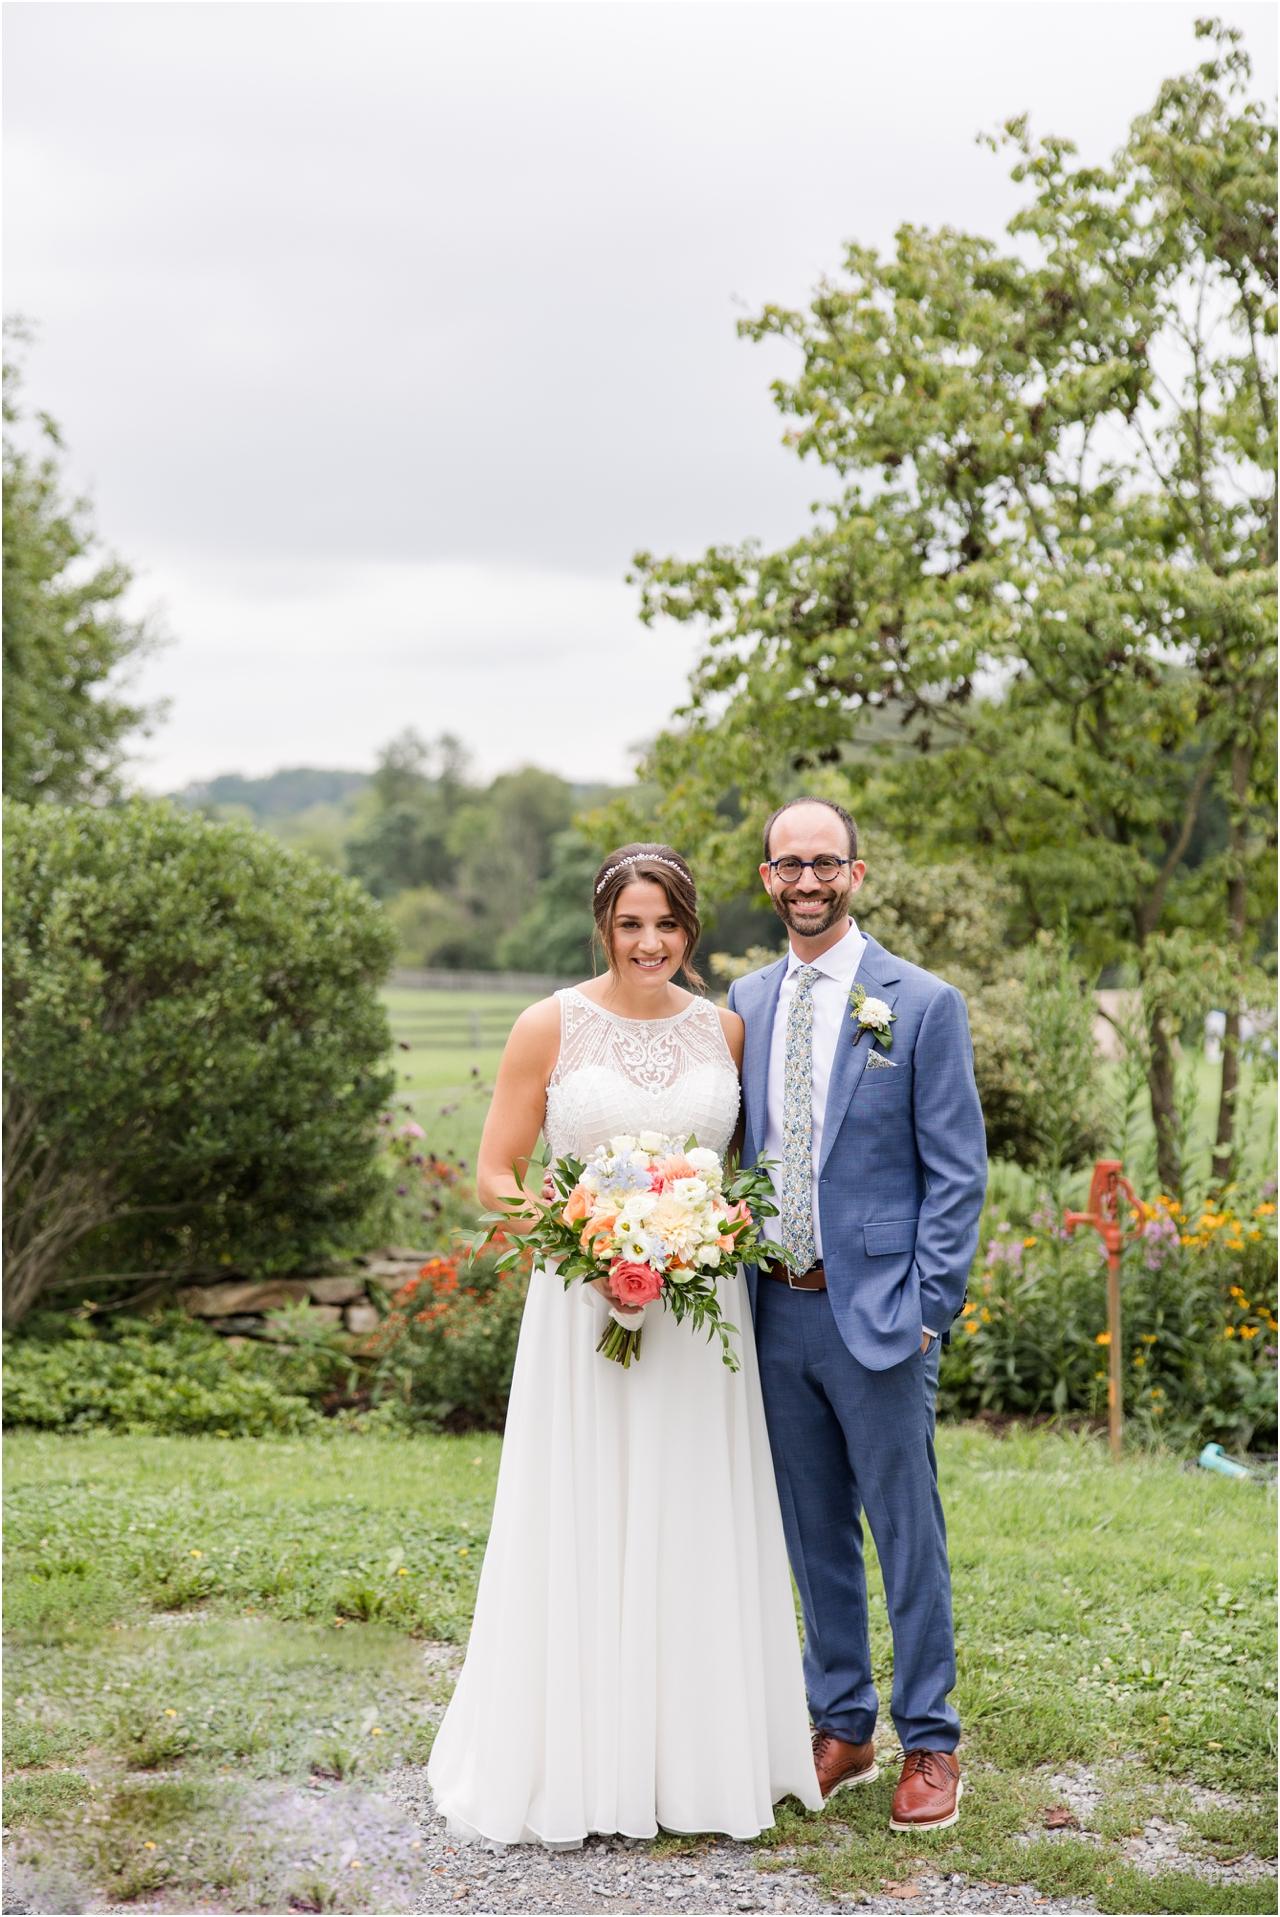 Sylvanside_Farm_Wedding_011